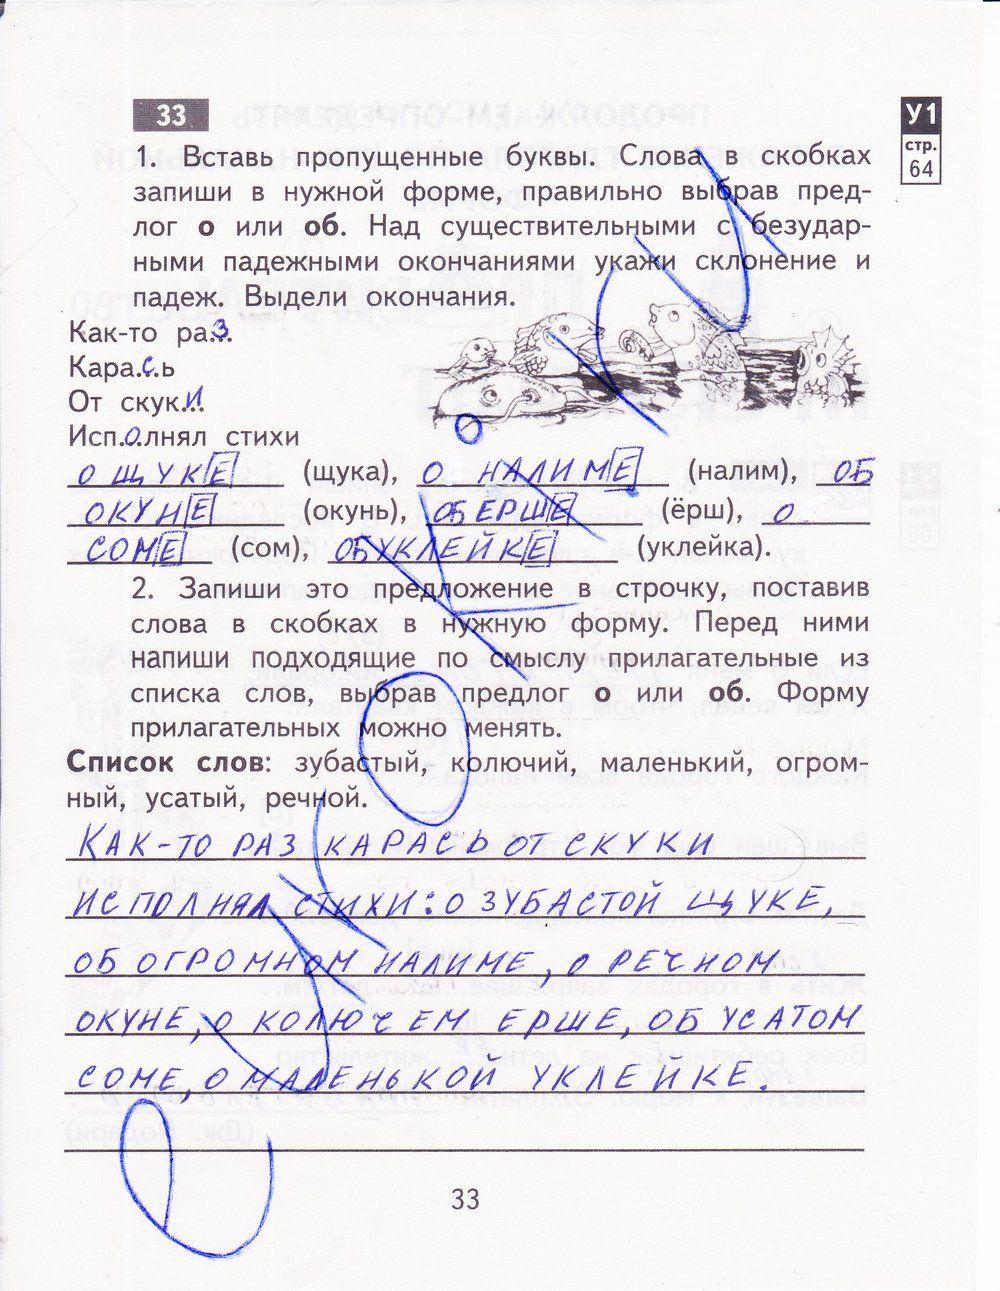 гдз по литературе 9 класс ахметзянов